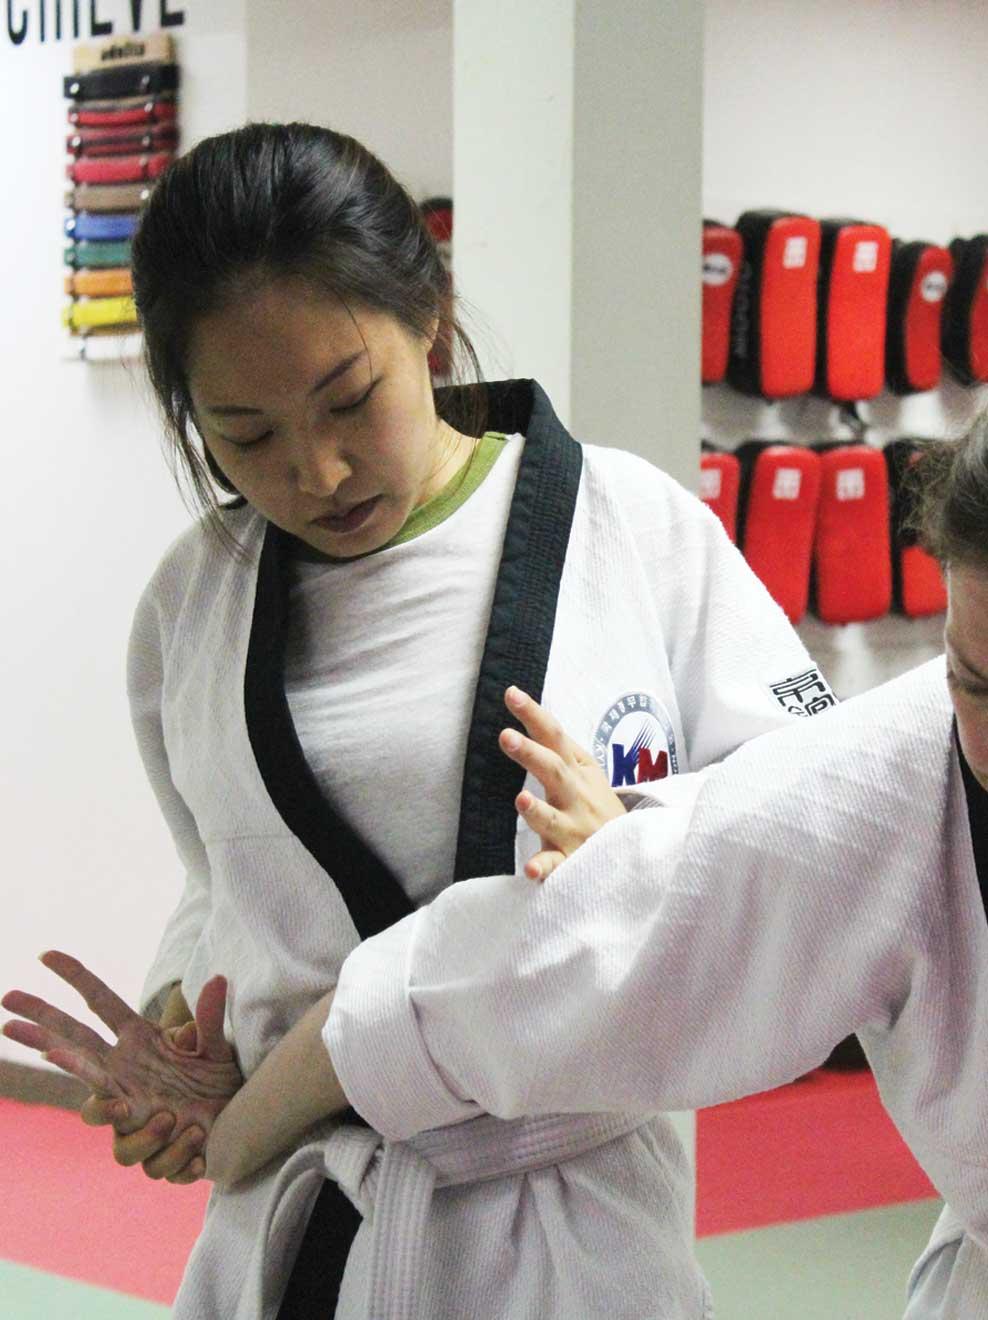 self defense classes Toronto